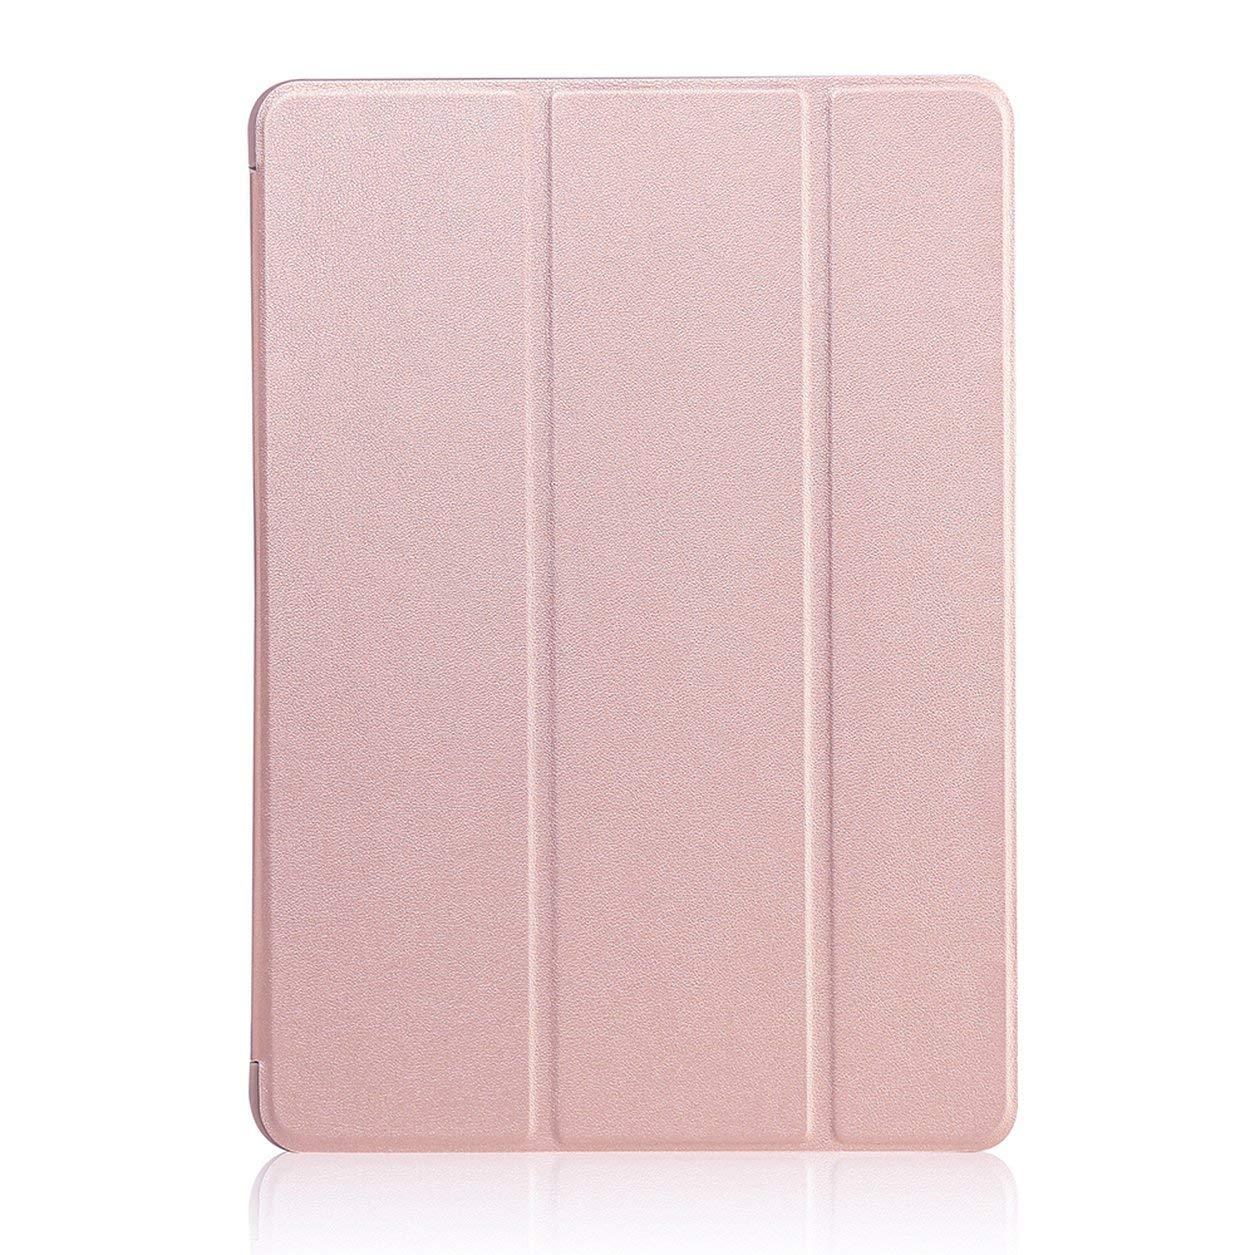 Dailyinshop® Para iPad 9.7 / Air1 / Air2 Funda Universal Funda de Silicona de Tres Pliegues Estuche para Tableta Estuche para Tableta con Todo Incluido Anticaída: Amazon.es: Hogar